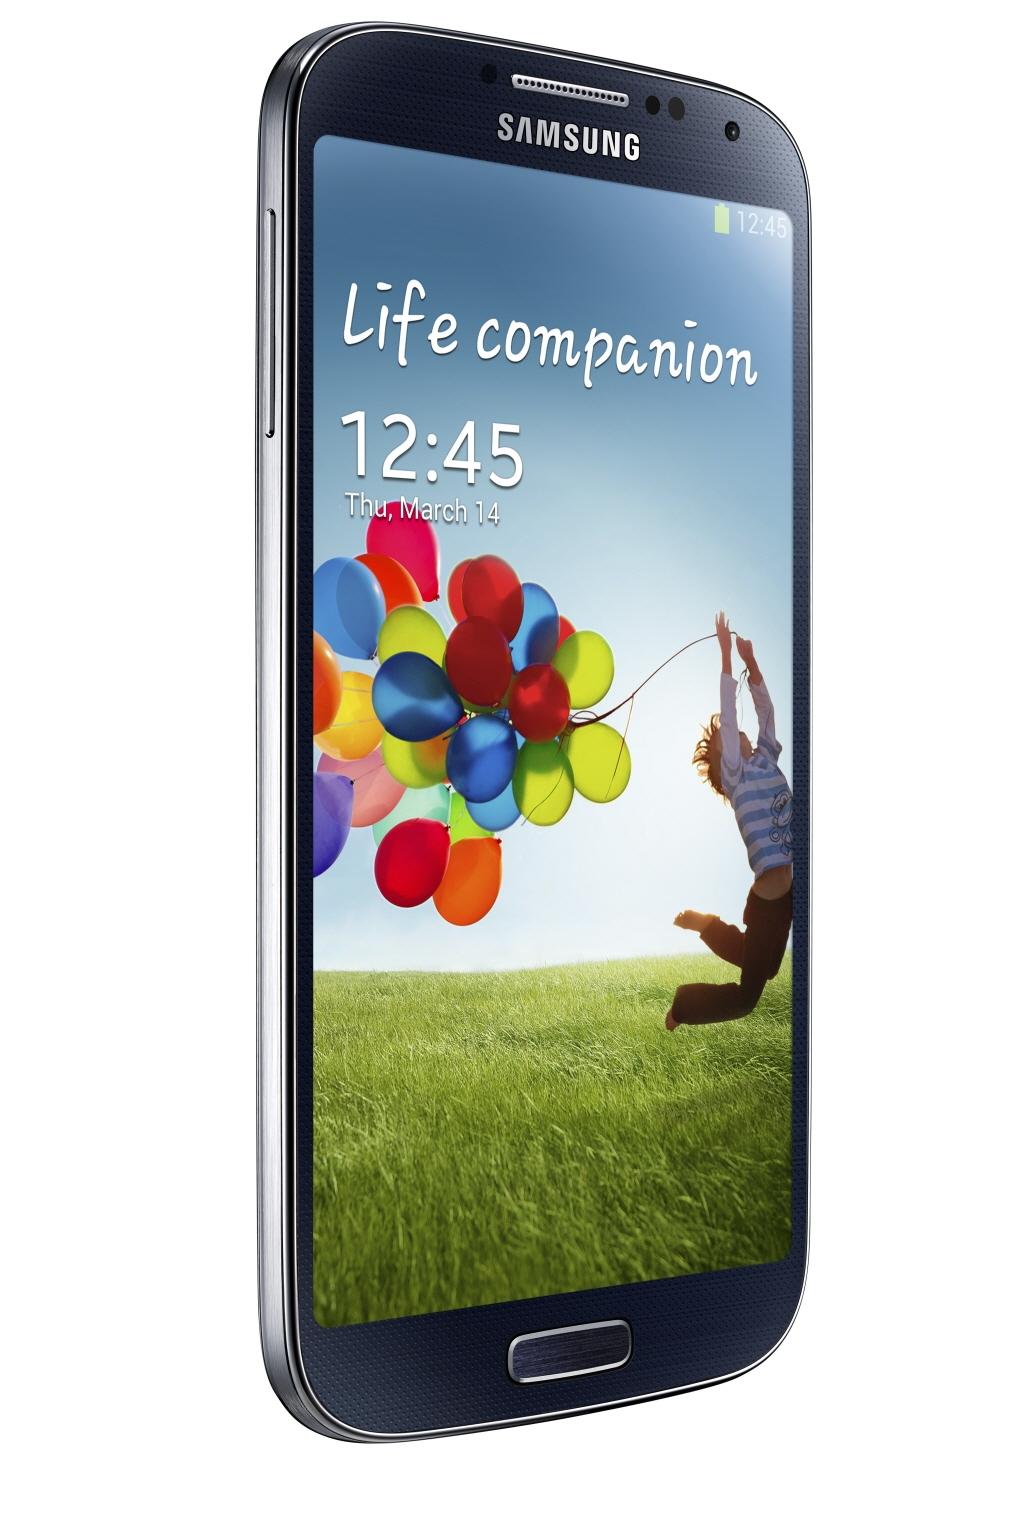 SamsungS42